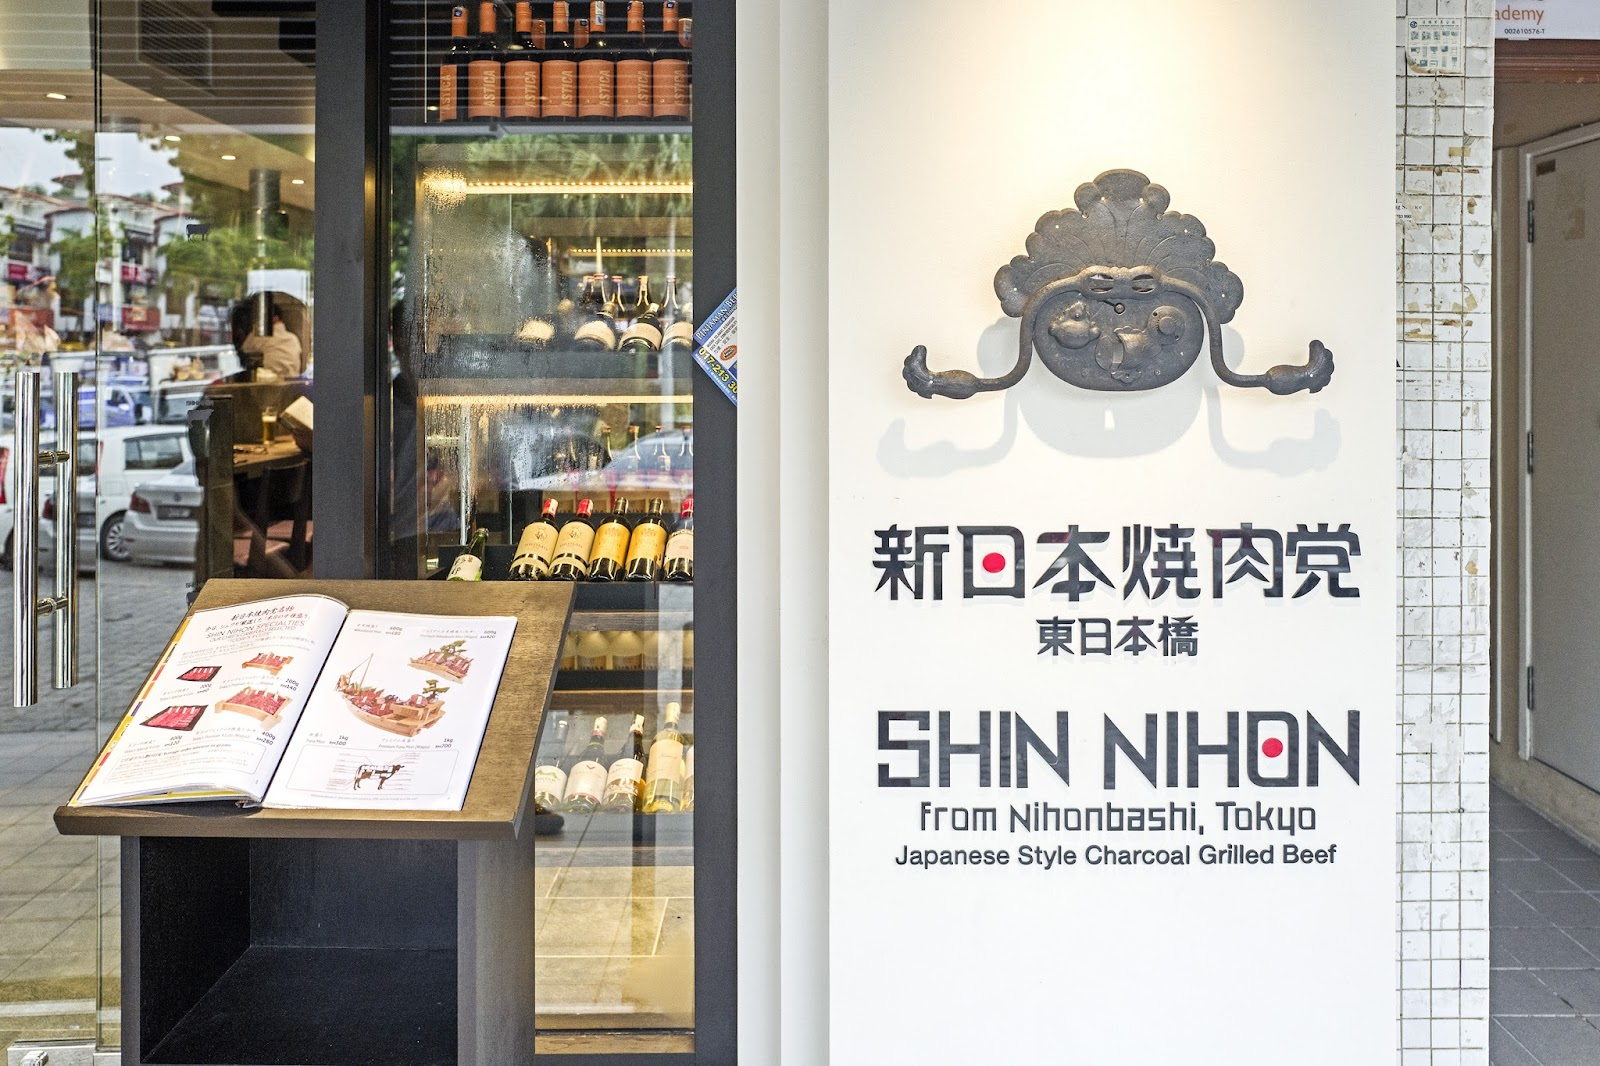 shinnihon-L1060668.jpg